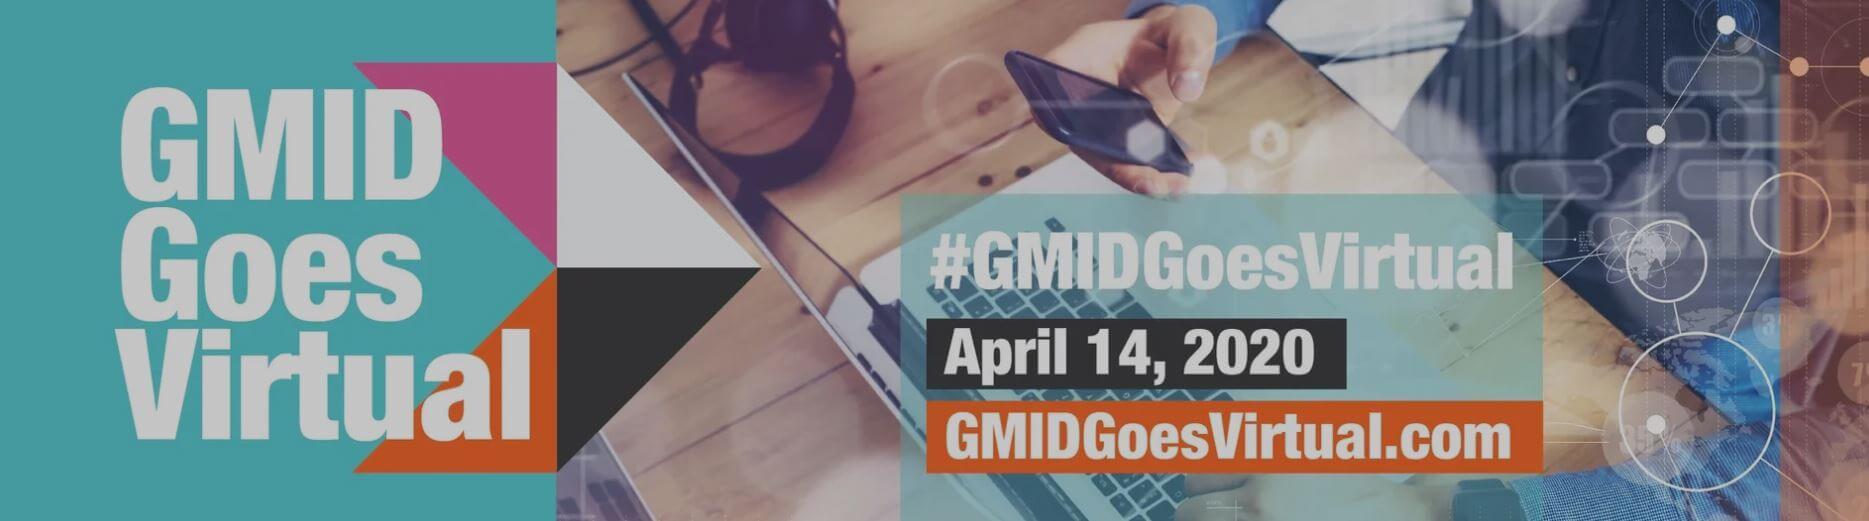 GMID Goes Virtual